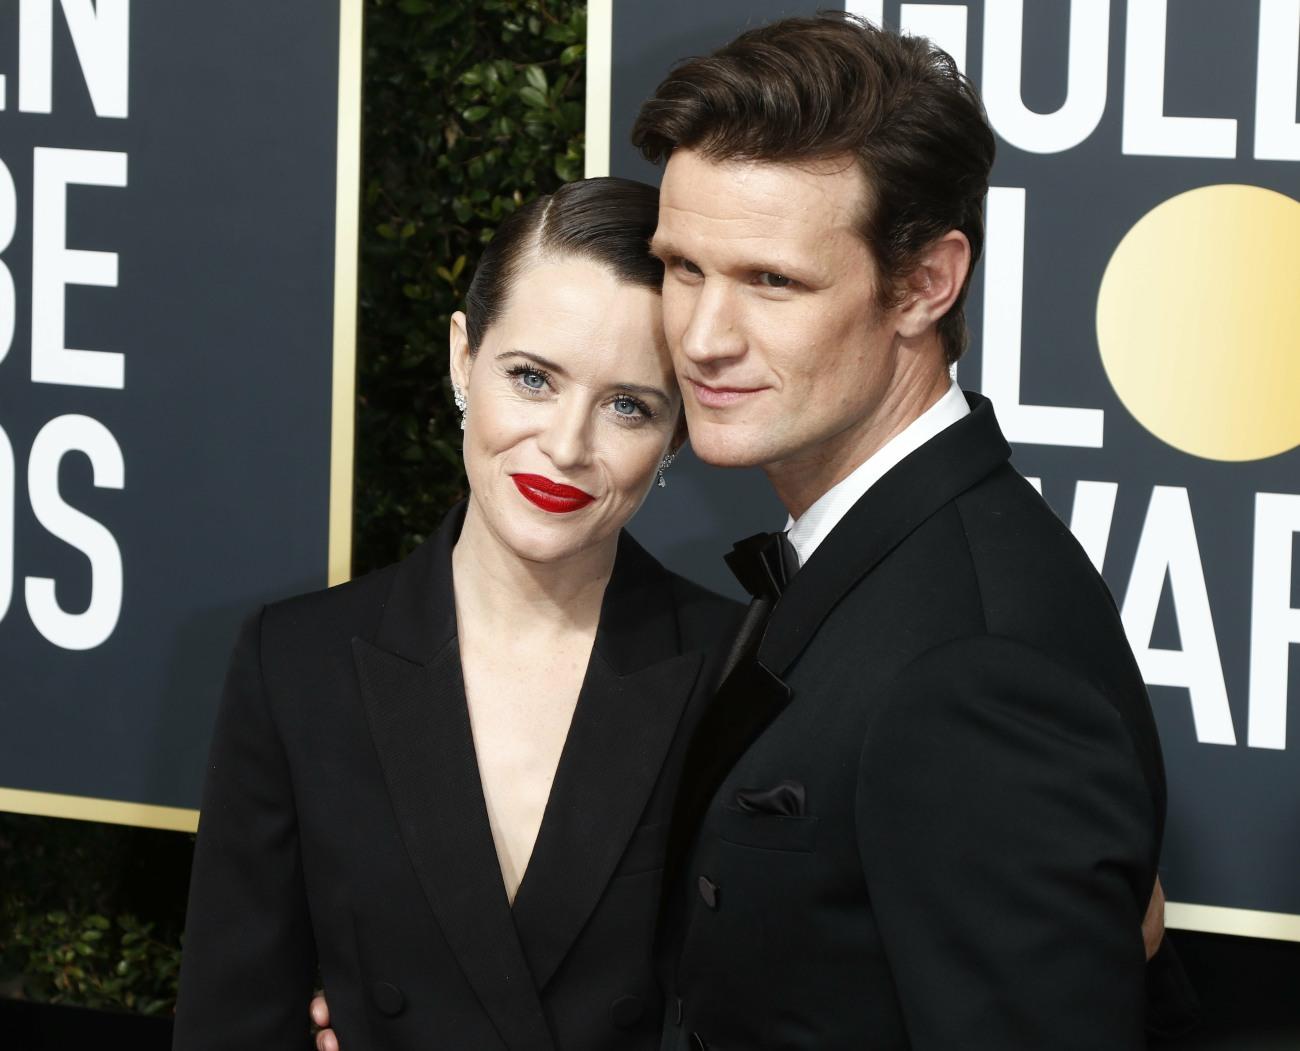 75th Golden Globe Awards - Arrivals